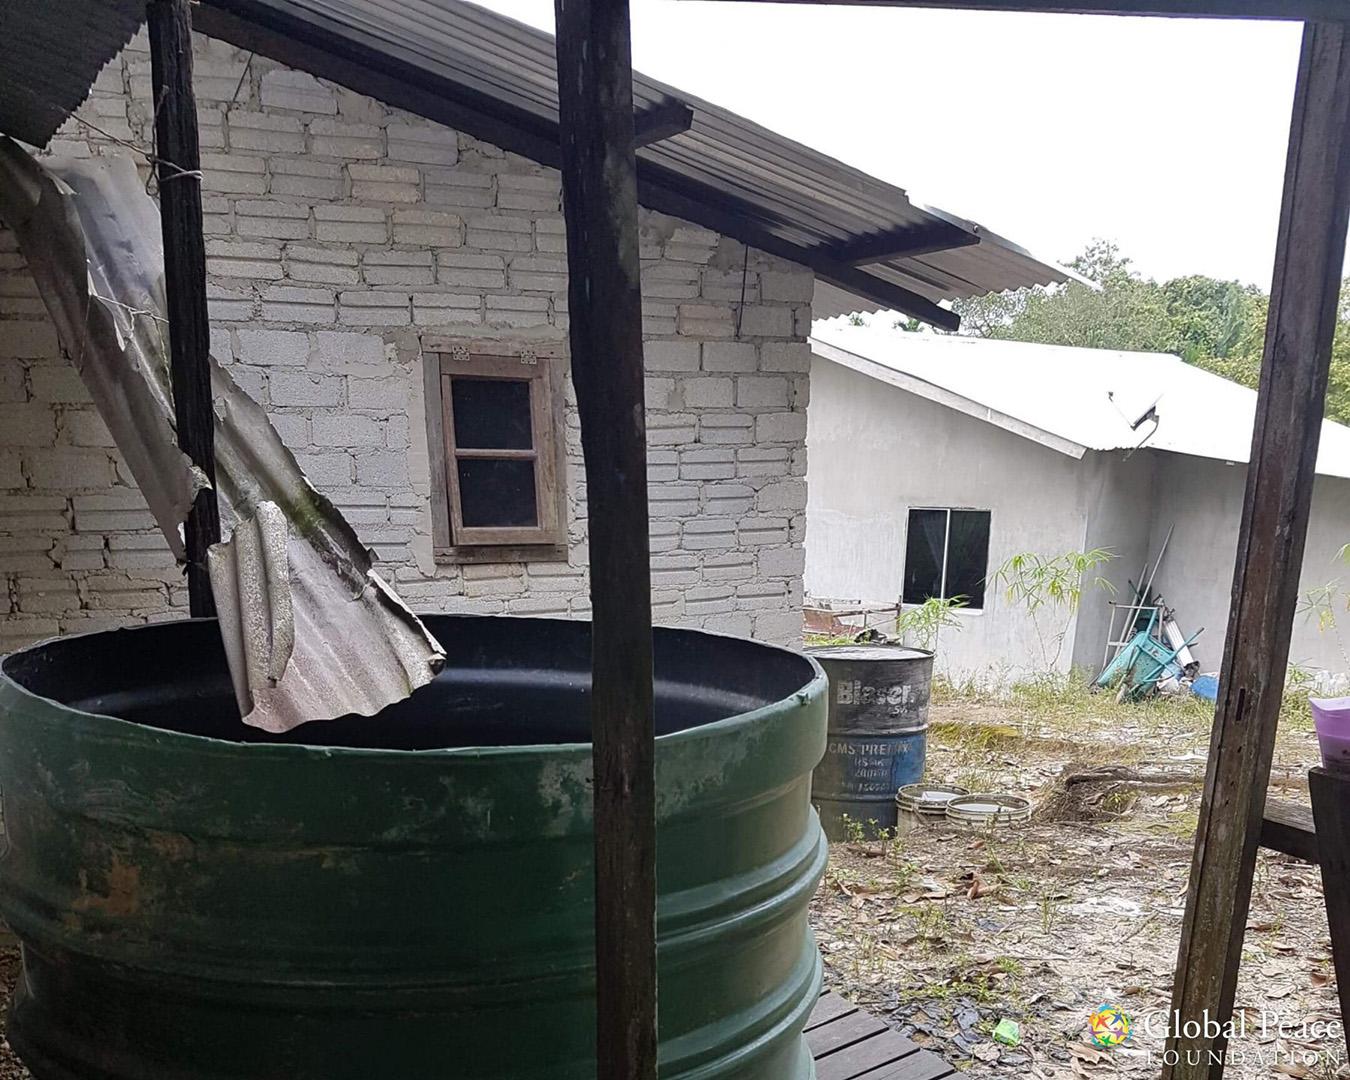 Rudimentary rainwater harvesting system